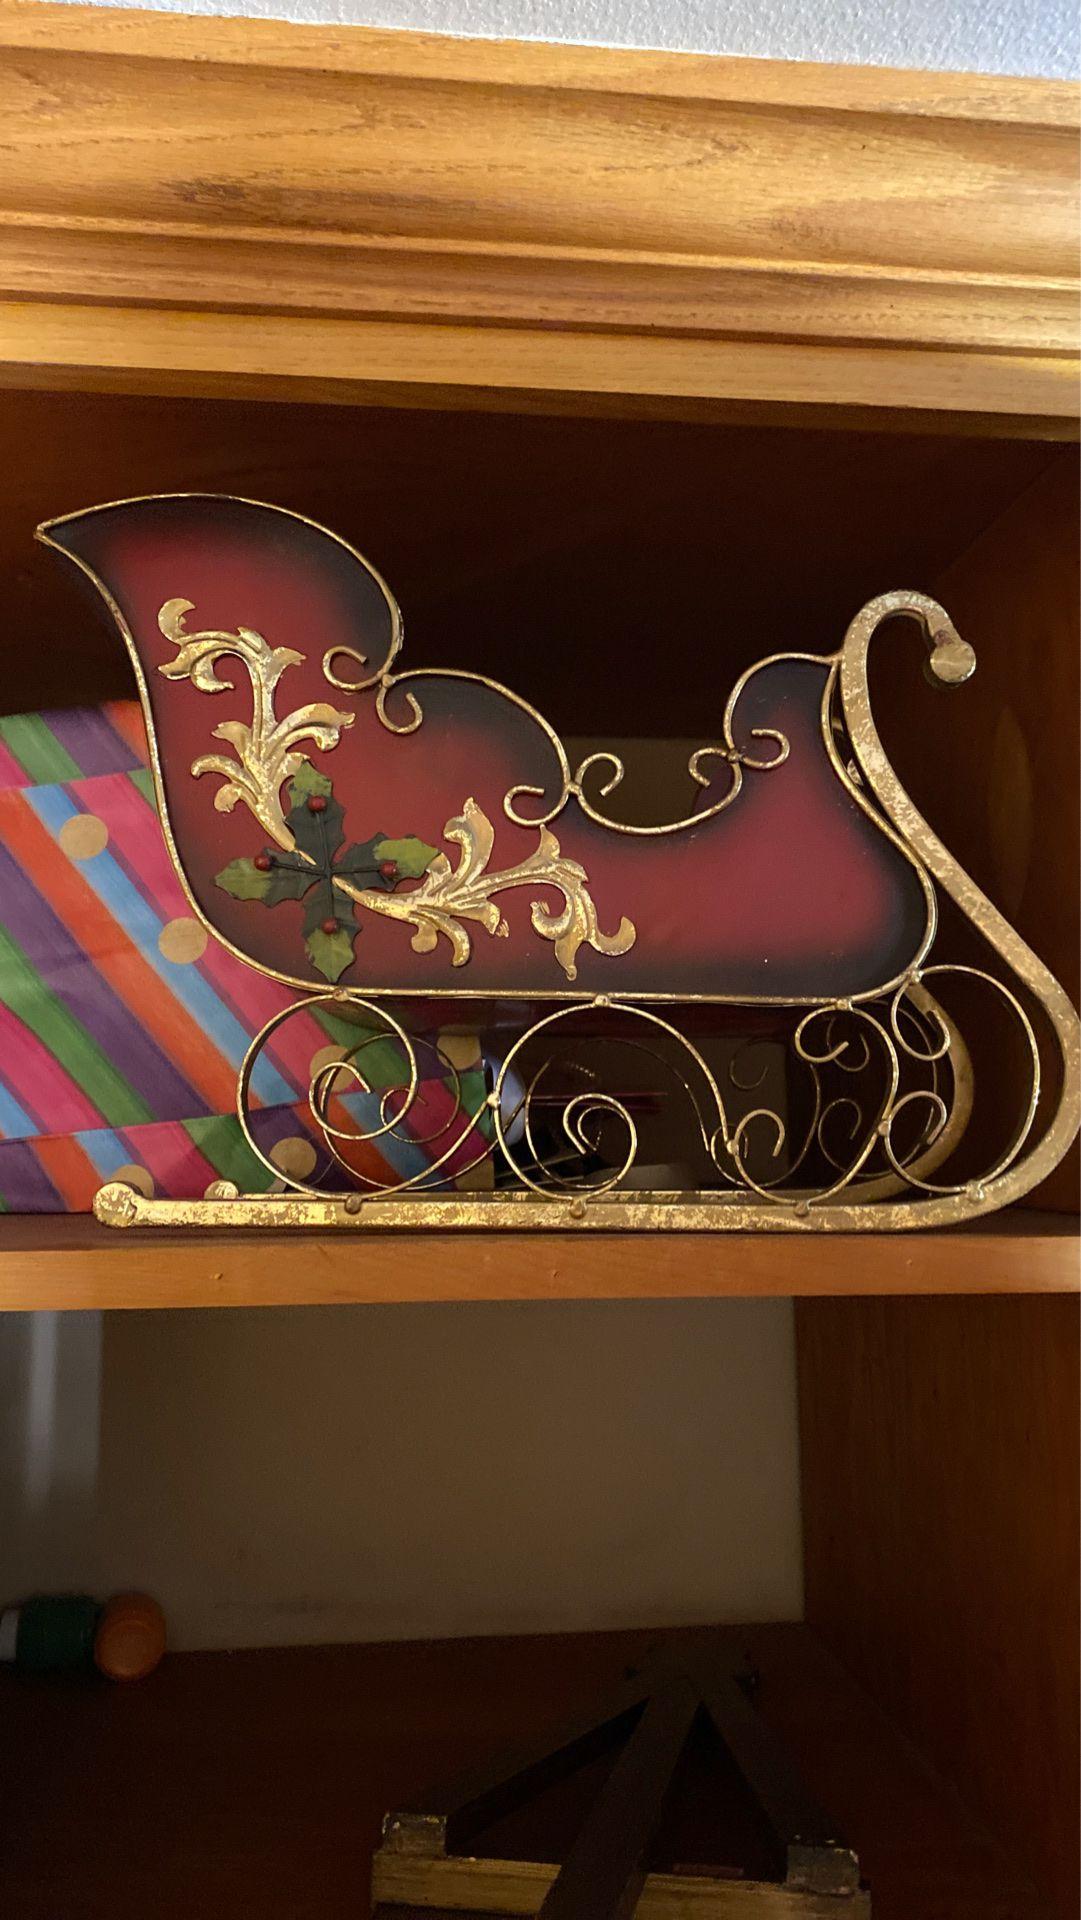 Decorating sleigh